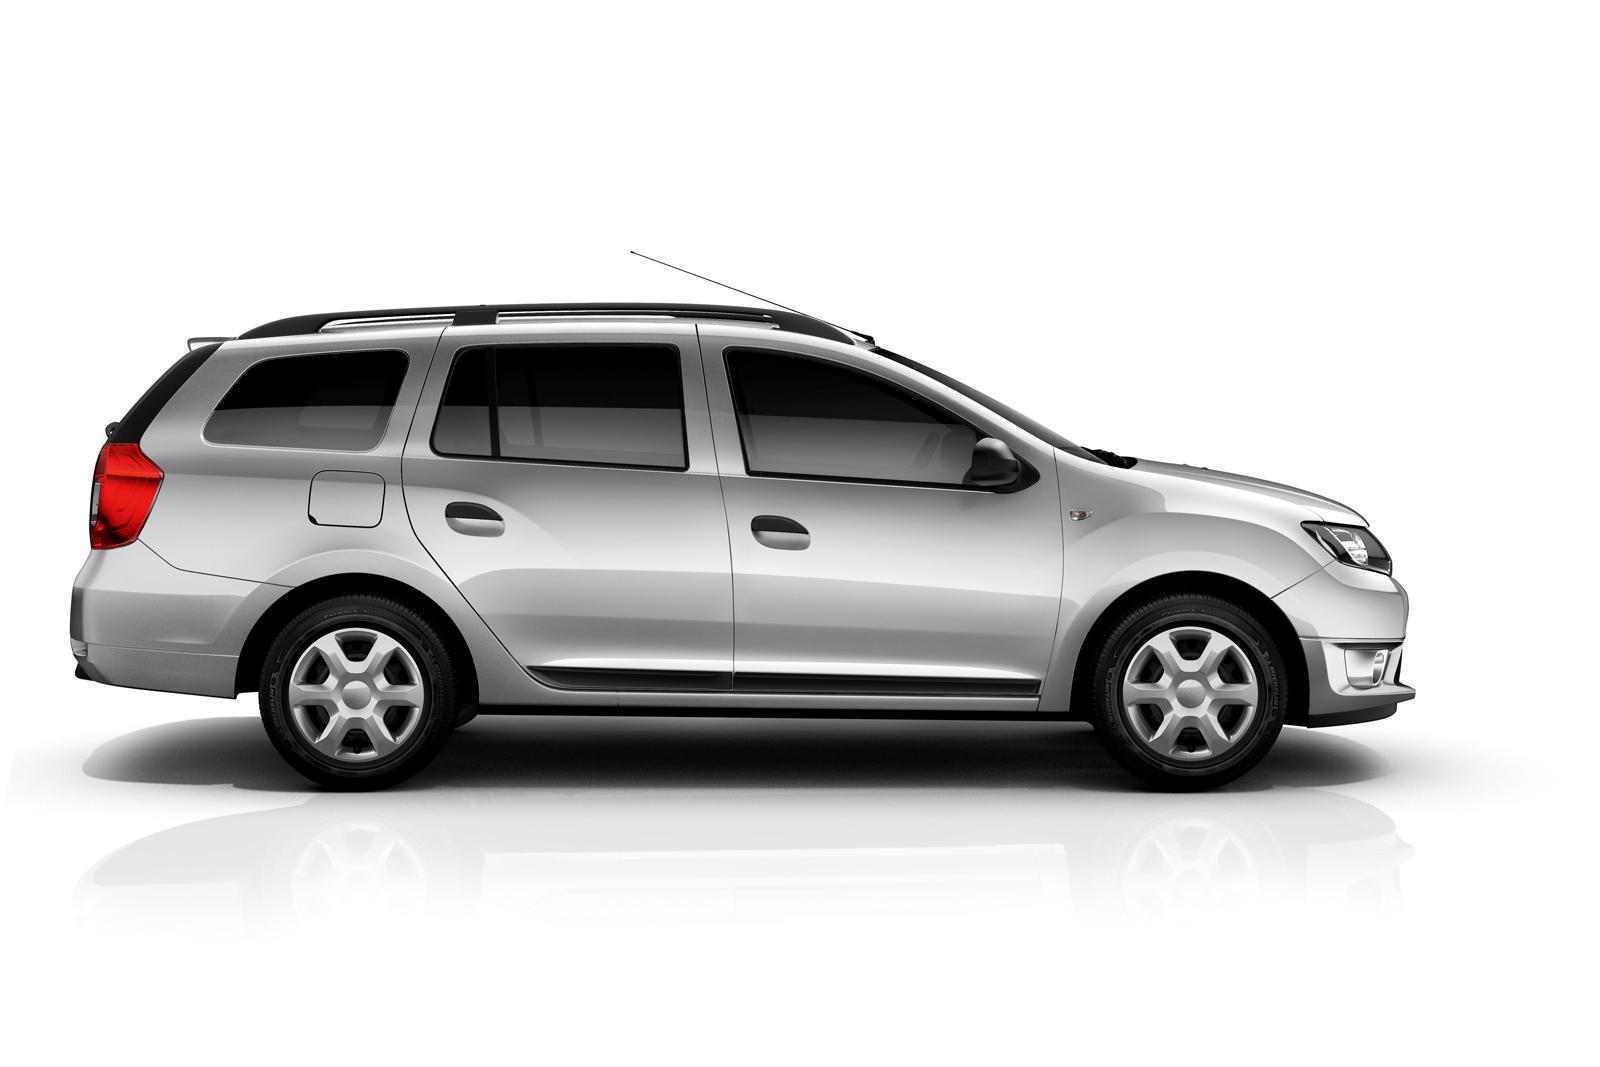 DIAGRAM] Wiring Diagram Renault Logan Familiar FULL Version ... on